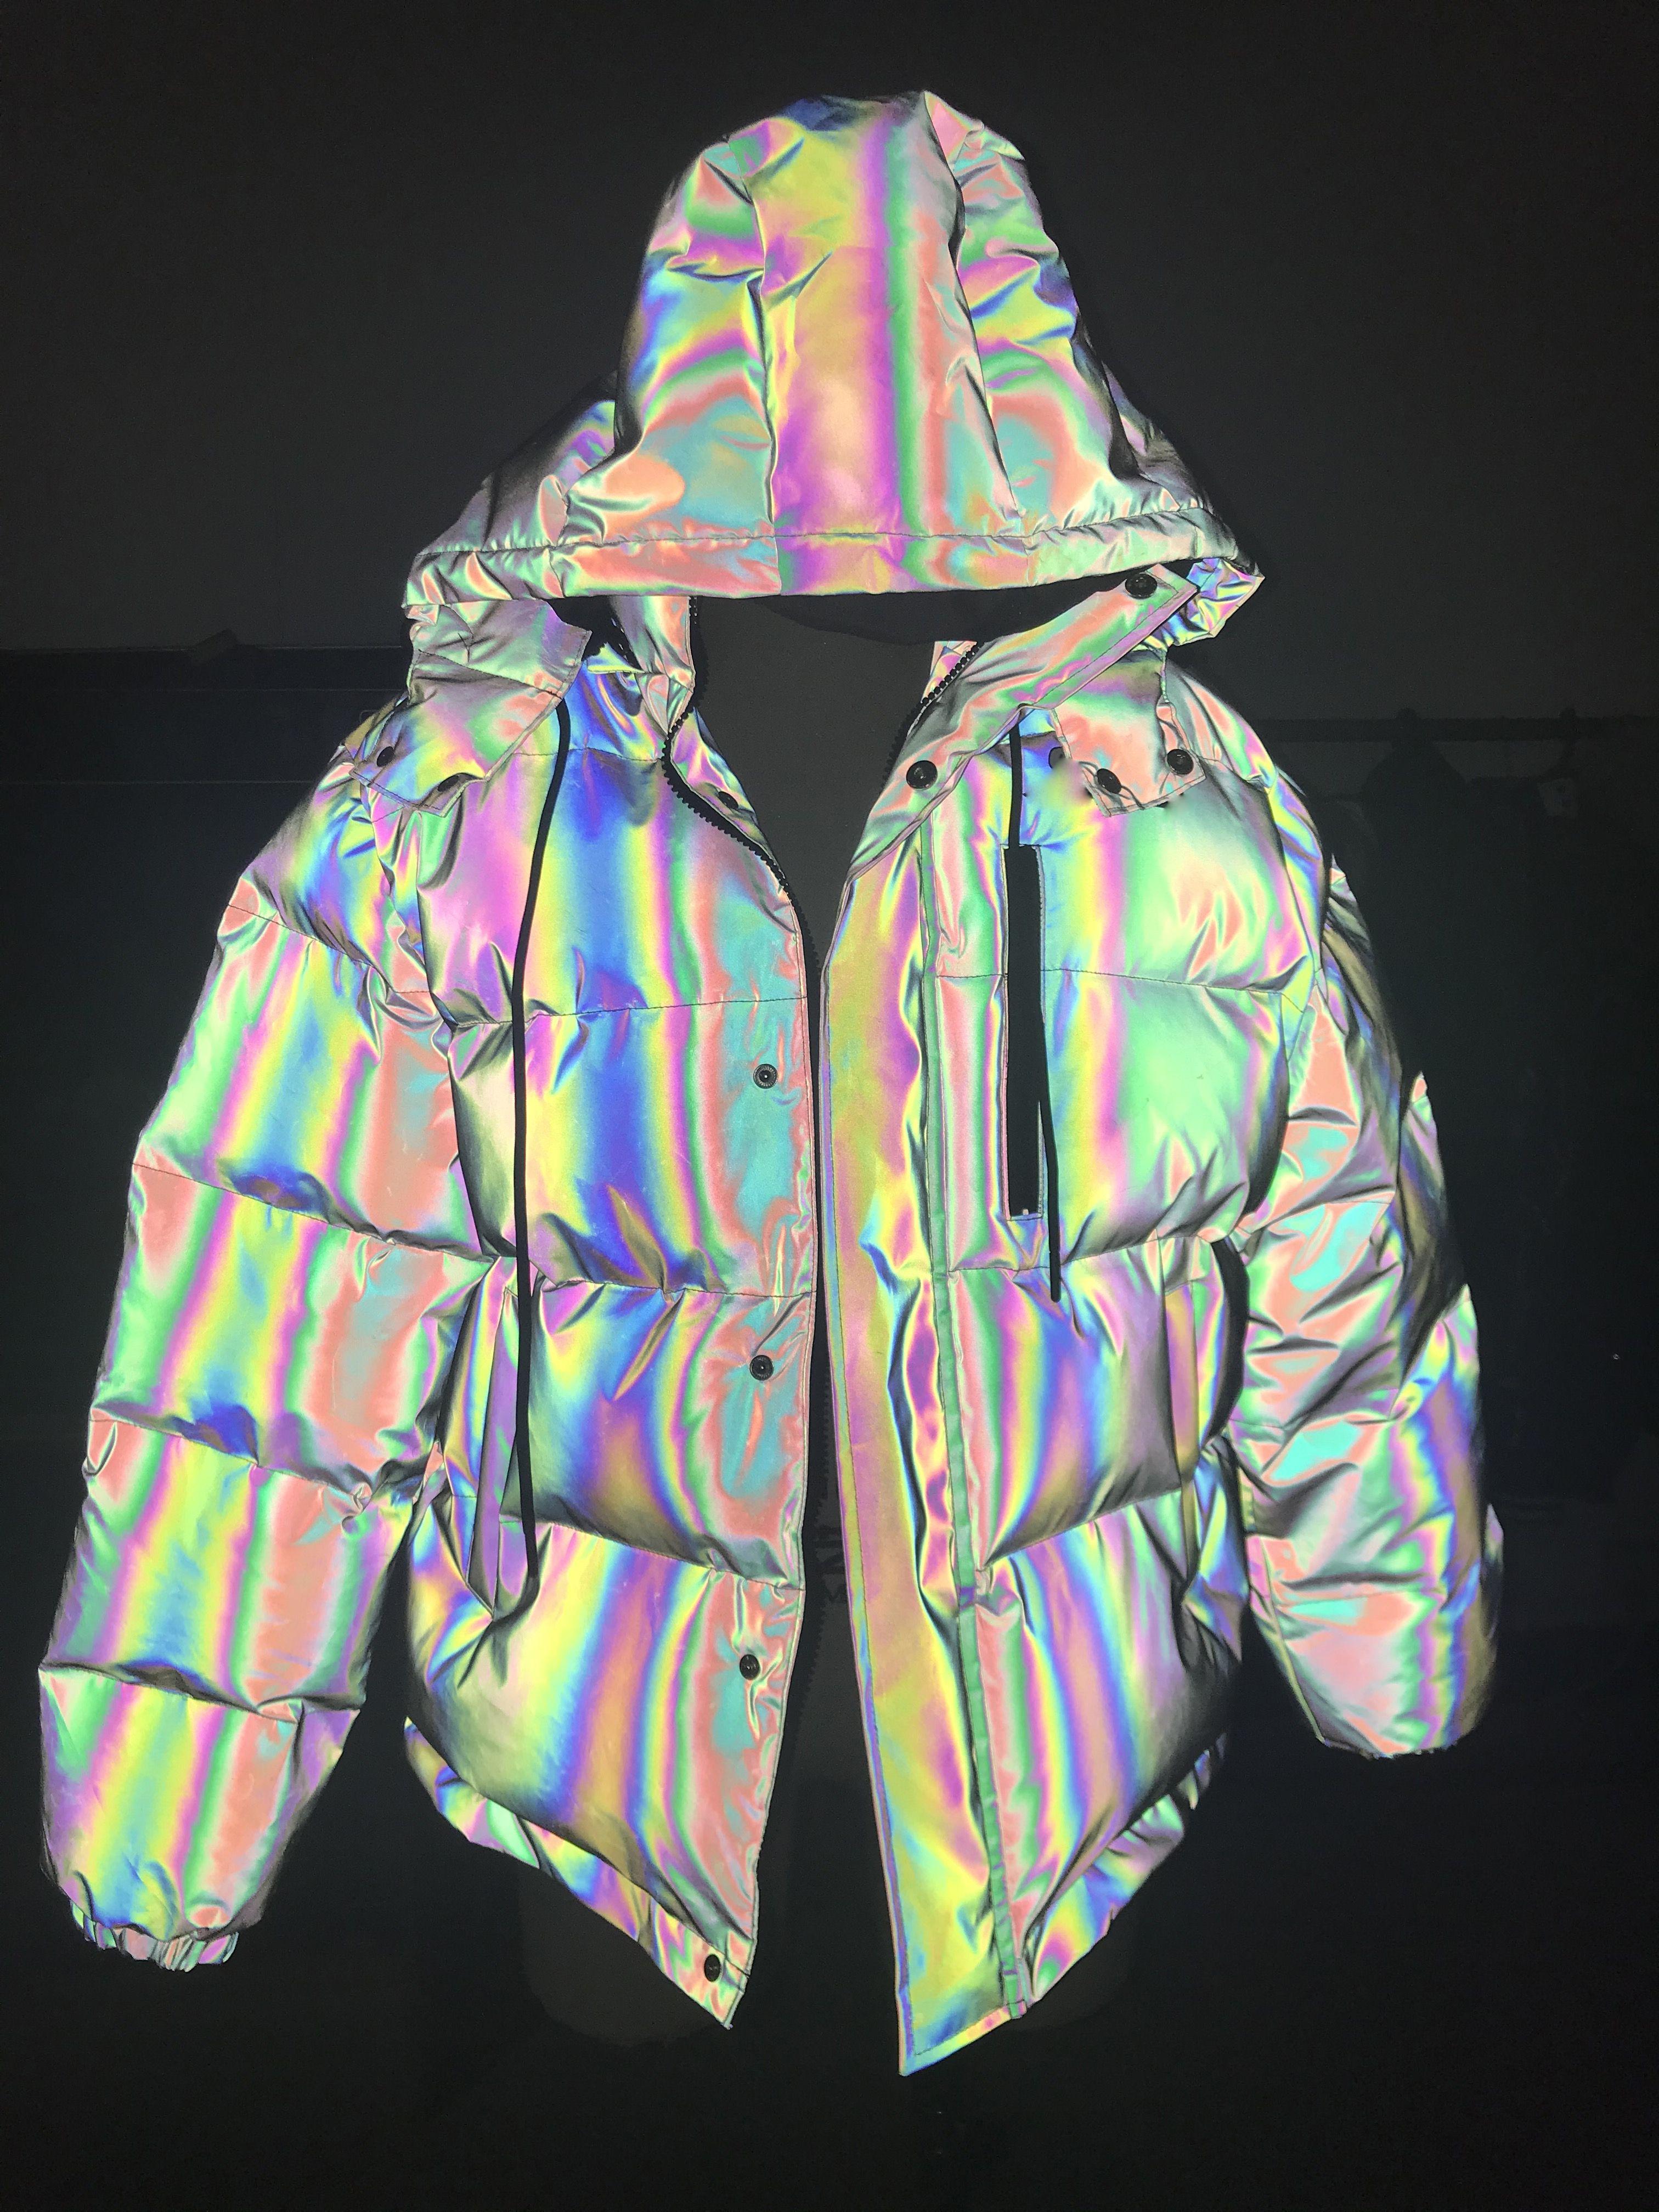 Cotton Filled Color Reflective Bubble Coat Winter Rainbow Puffer Jacket Buy Rainbow Puffer Jacket Color Reflect Bubble Coat Colorful Coat Coats Jackets Women [ 4032 x 3024 Pixel ]